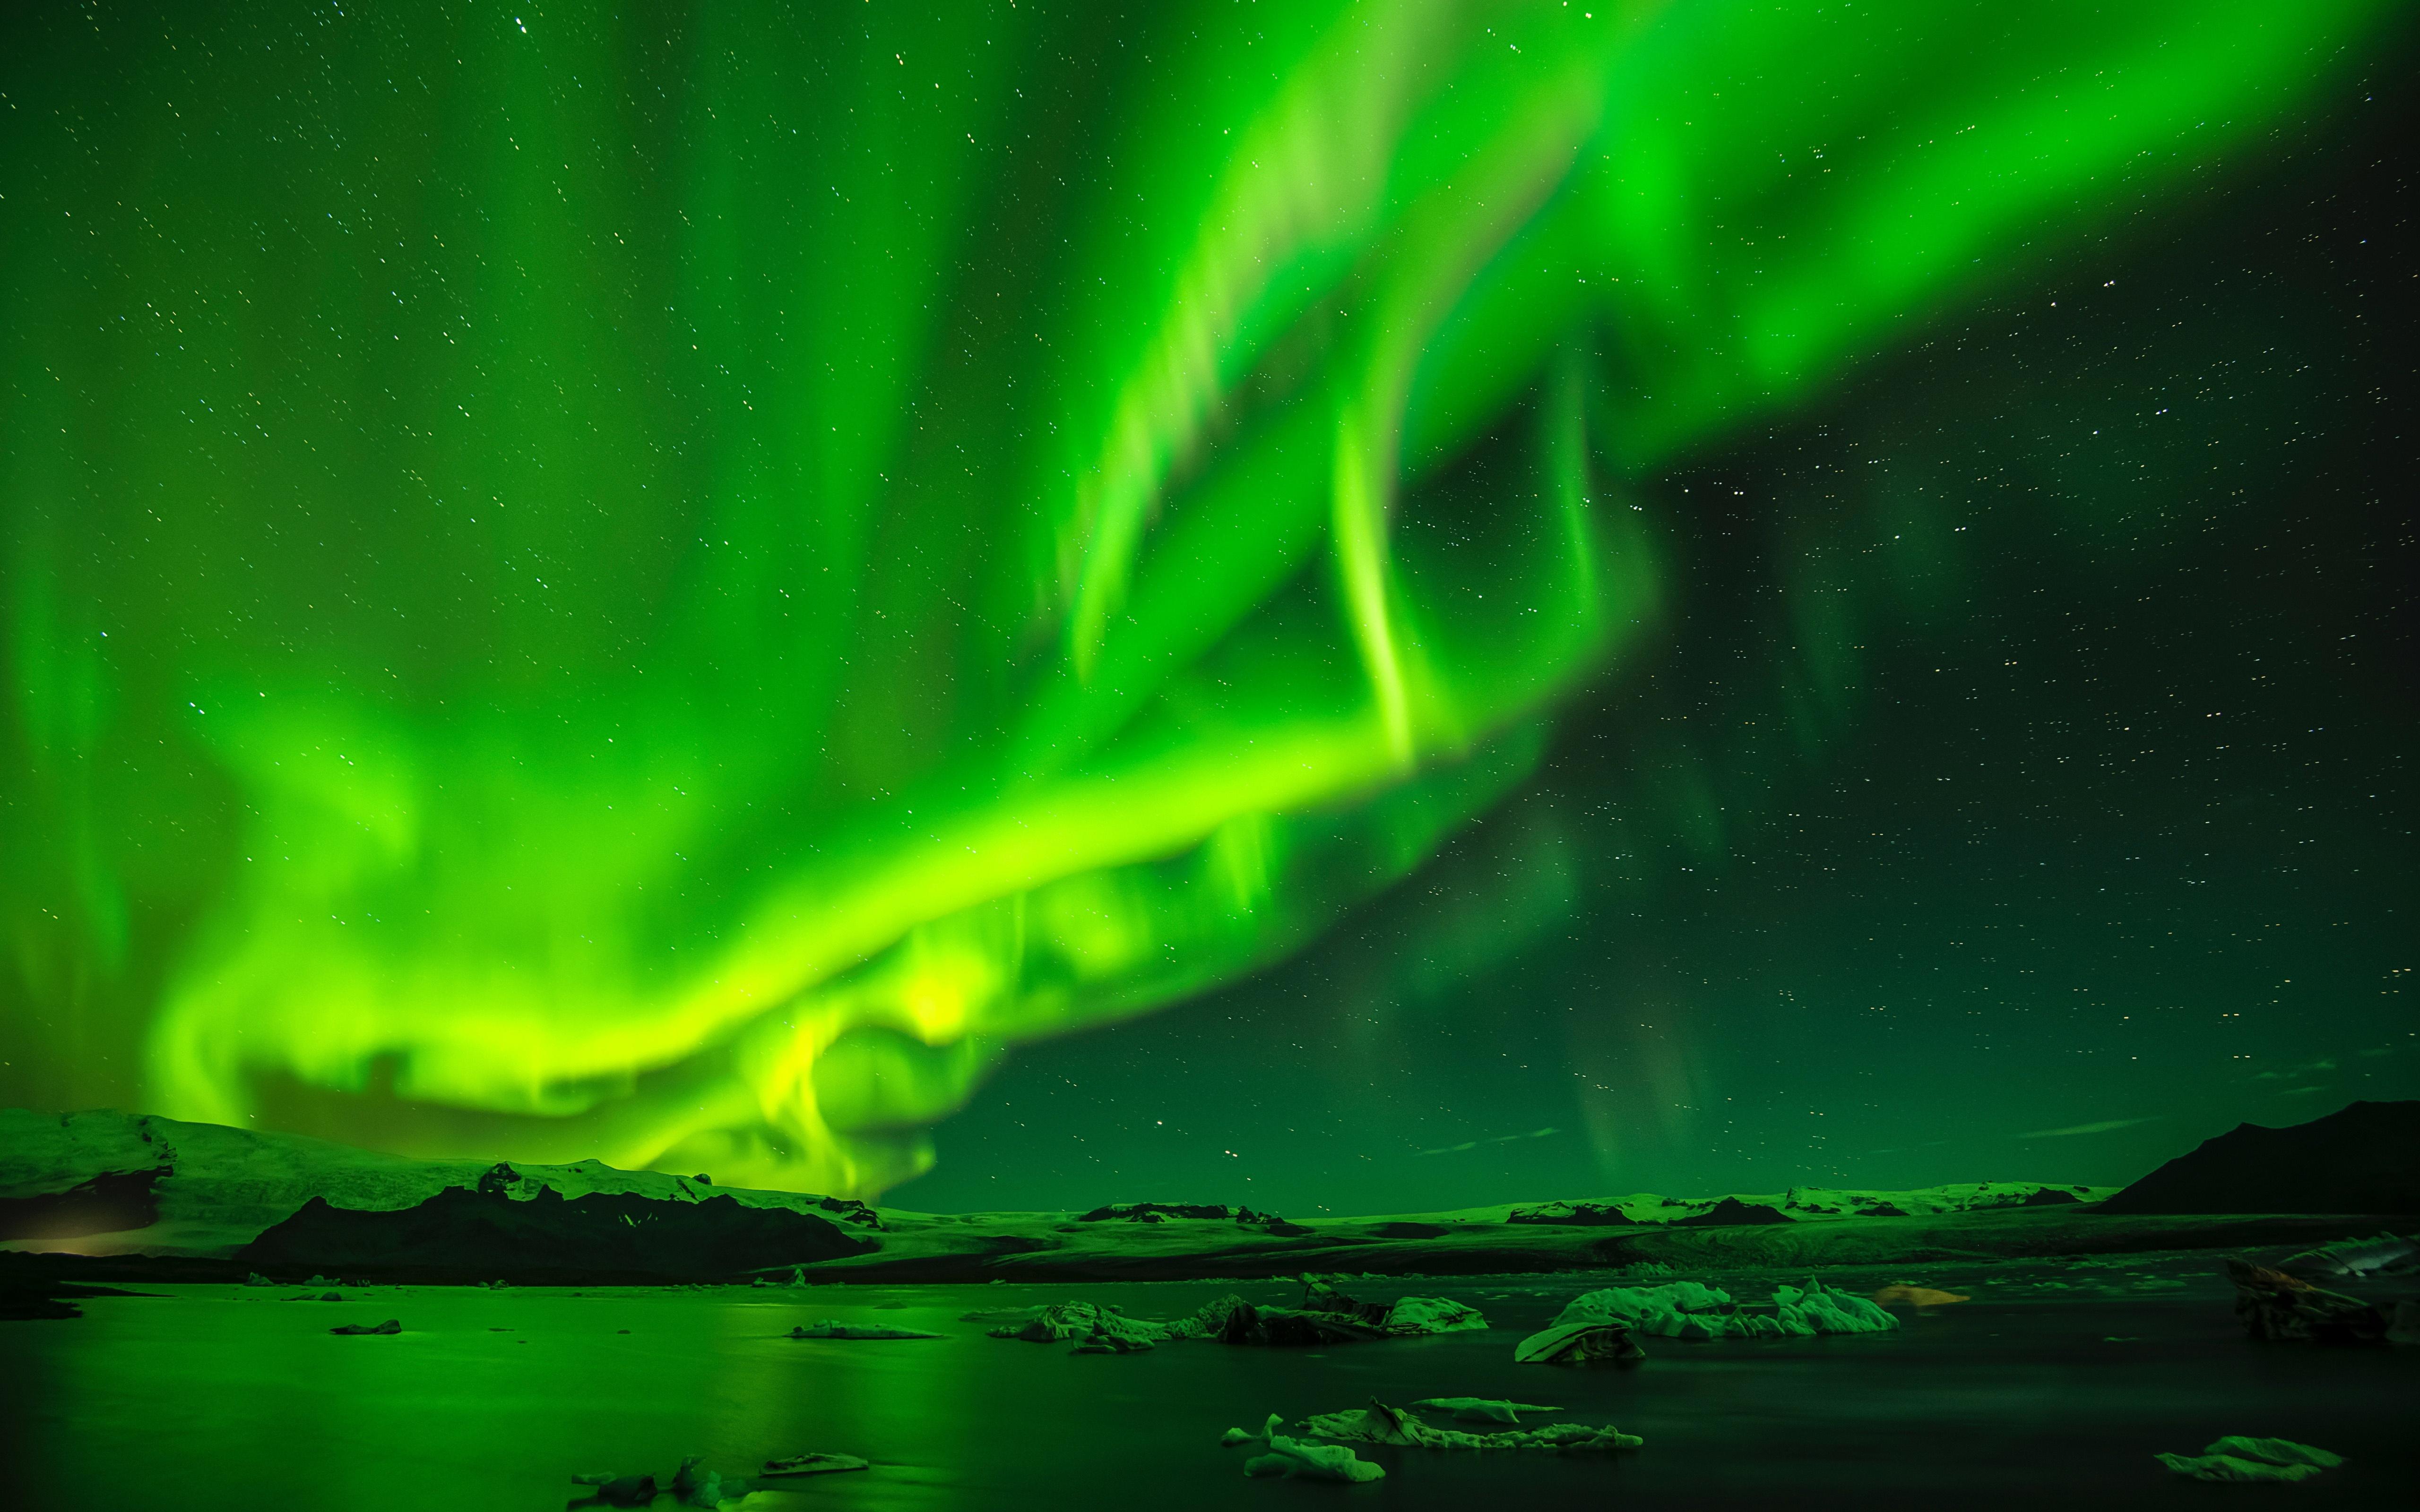 Nature Night Sky Light 5120x3200